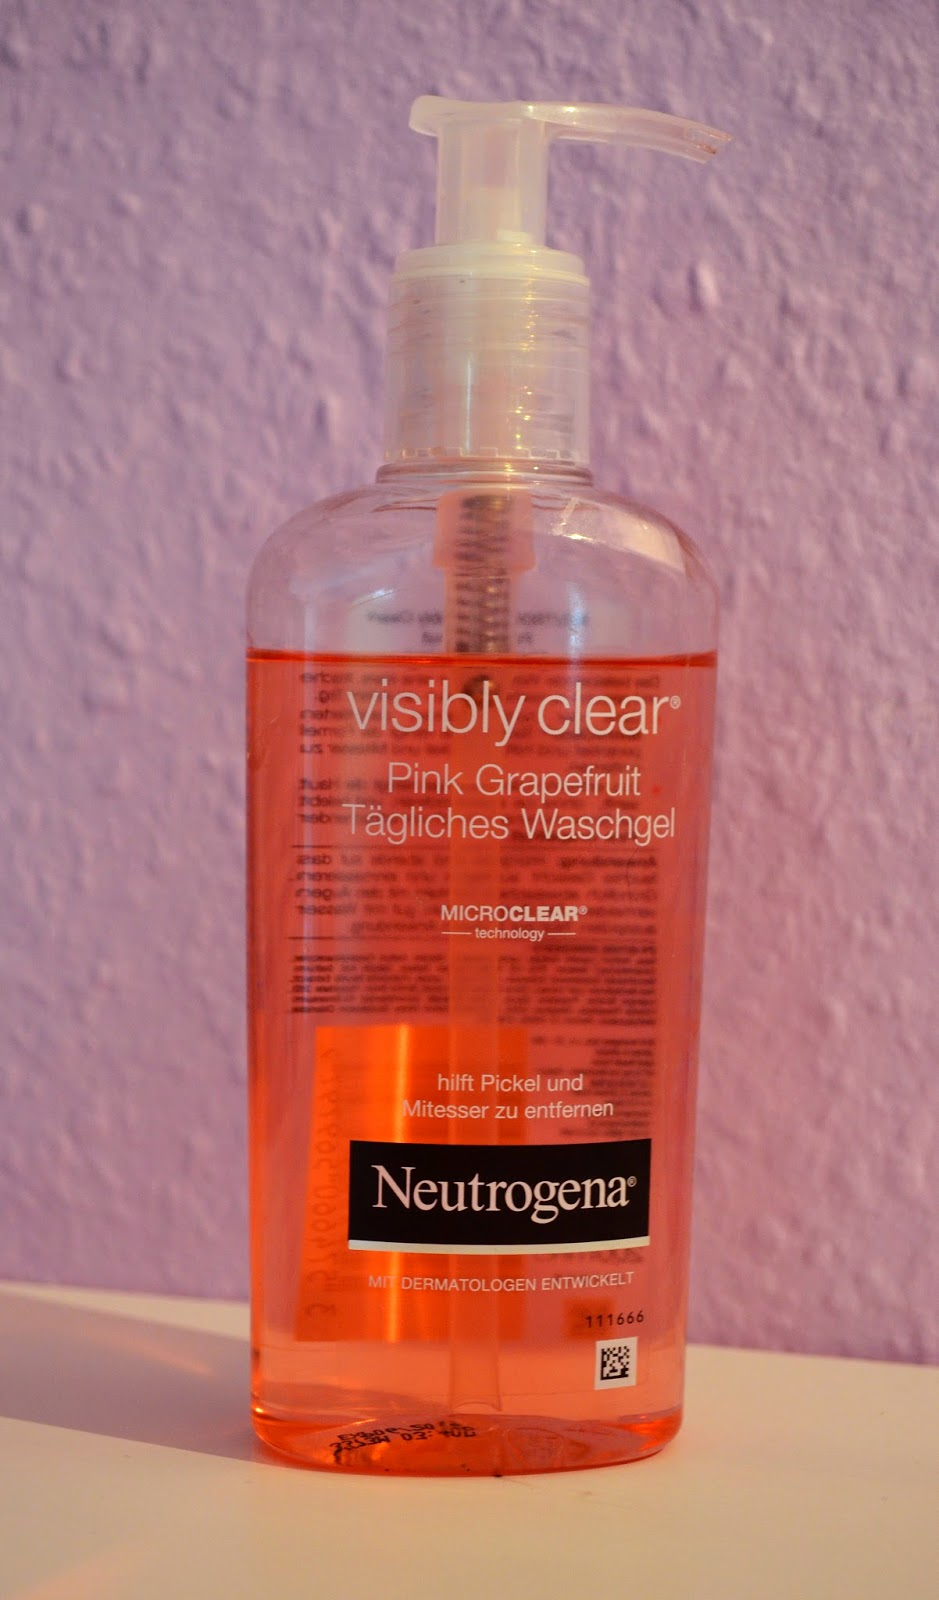 soulpaint review neutrogena visibly clear pink grapefruit. Black Bedroom Furniture Sets. Home Design Ideas